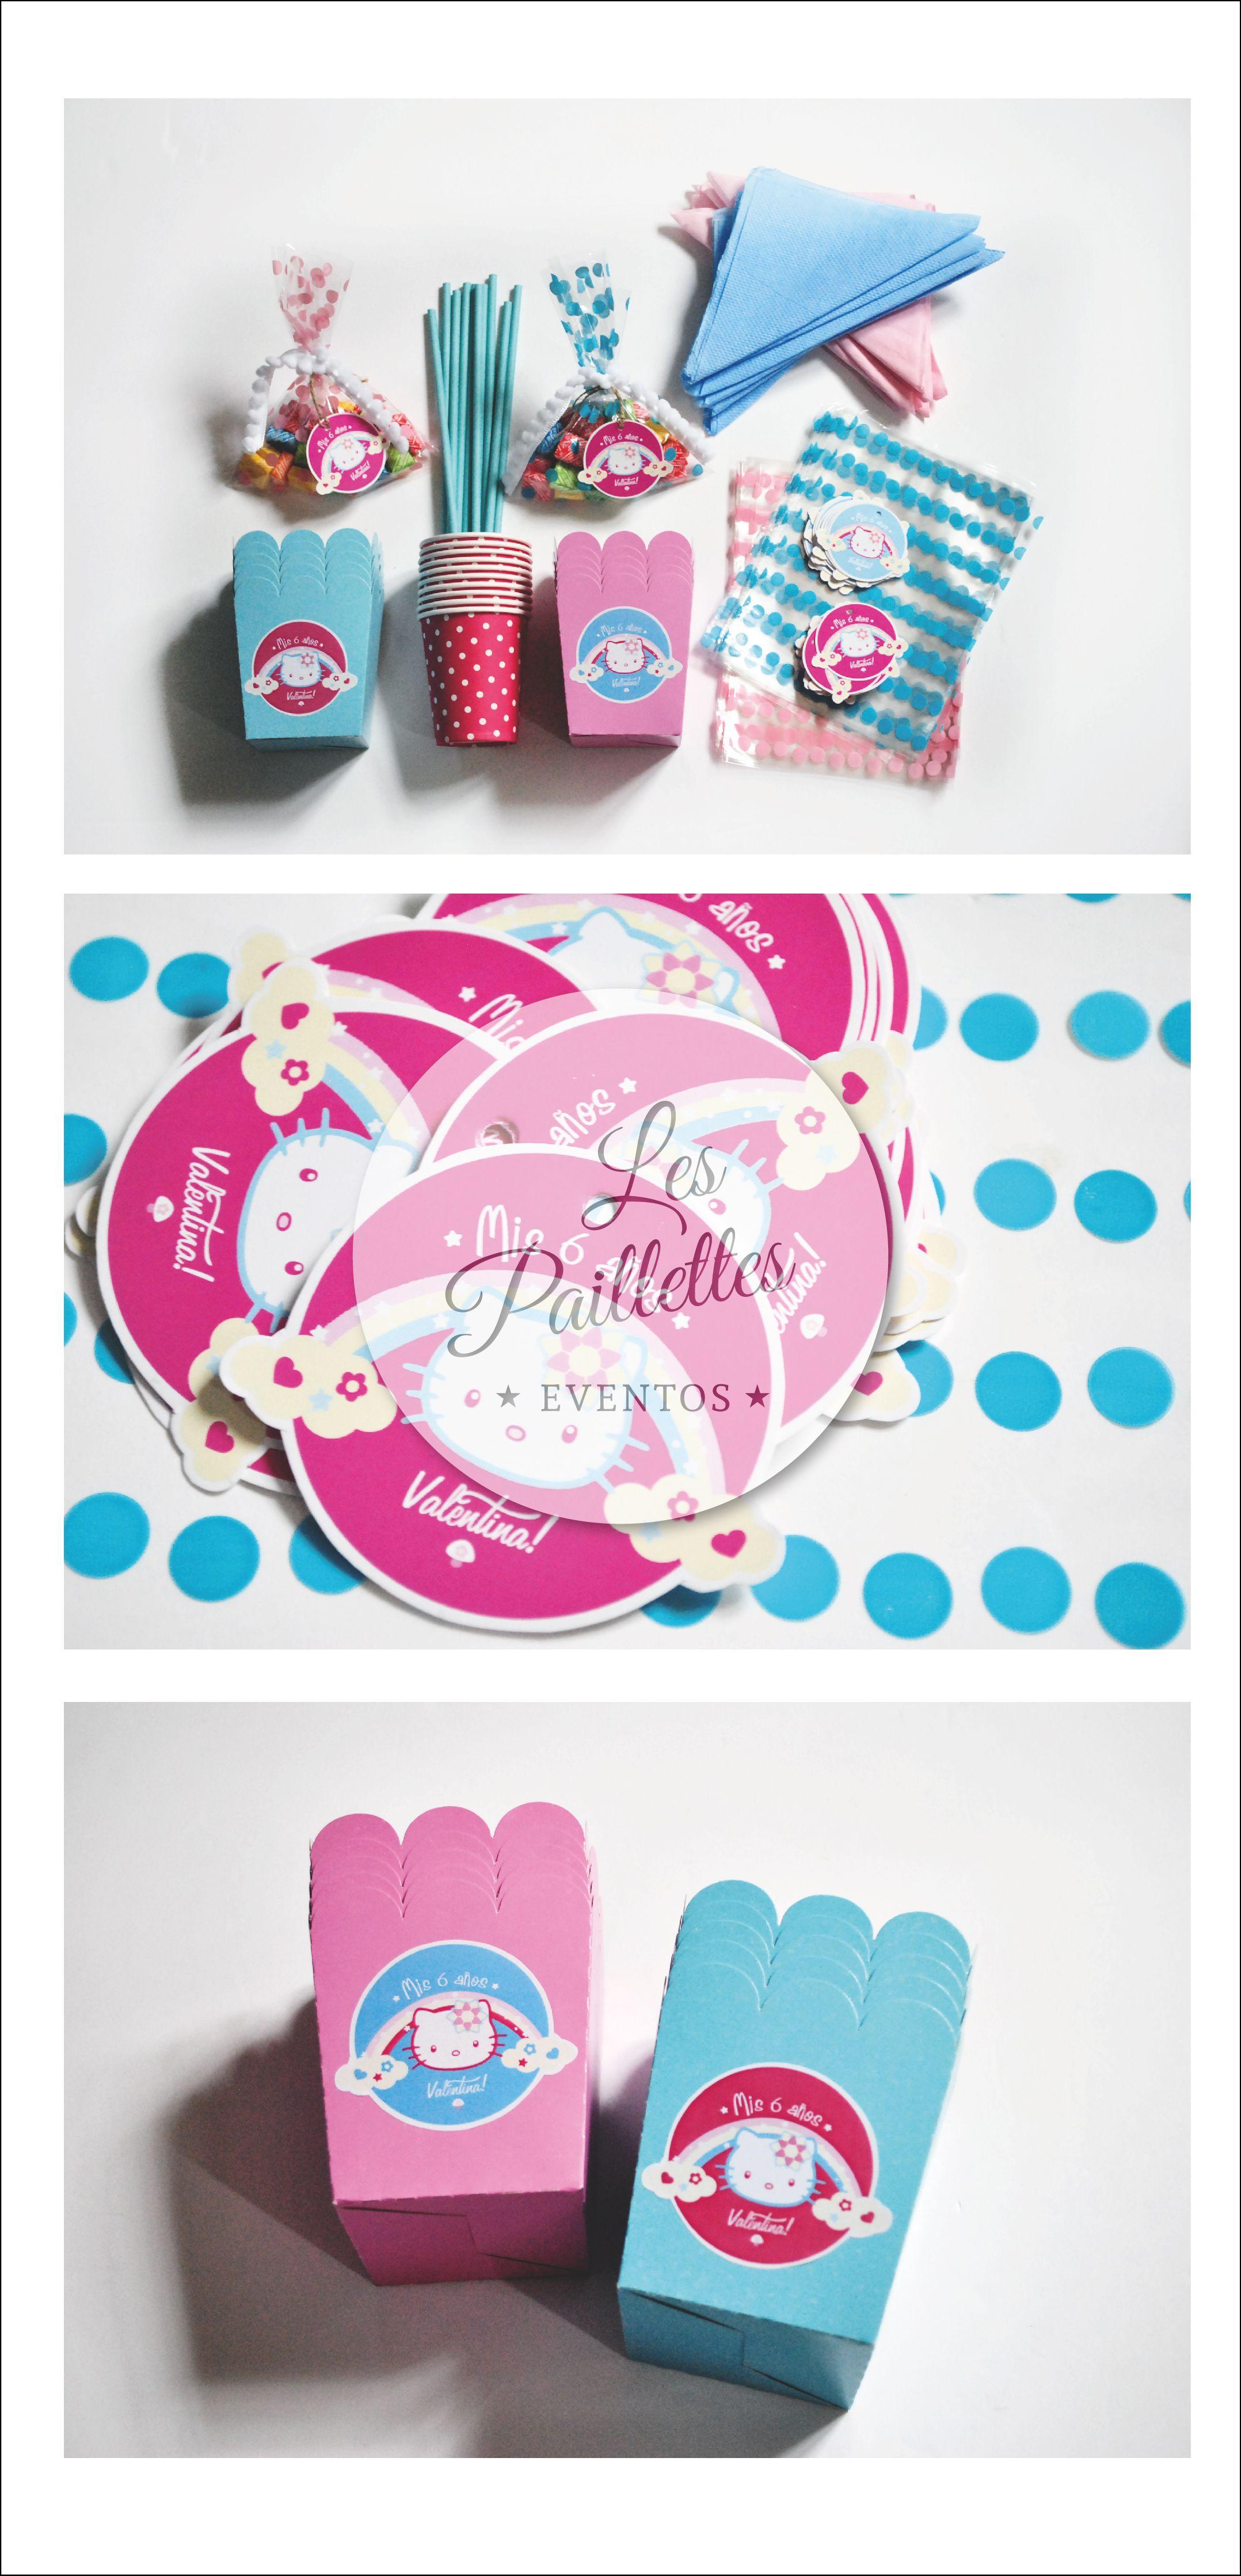 Kit Cumpleaños Hello Kitty. #partysupplies #insumos #vasos #sorbetes #pochocleras #bolsitas #golosinas #candybar #kitty #rosa #celeste